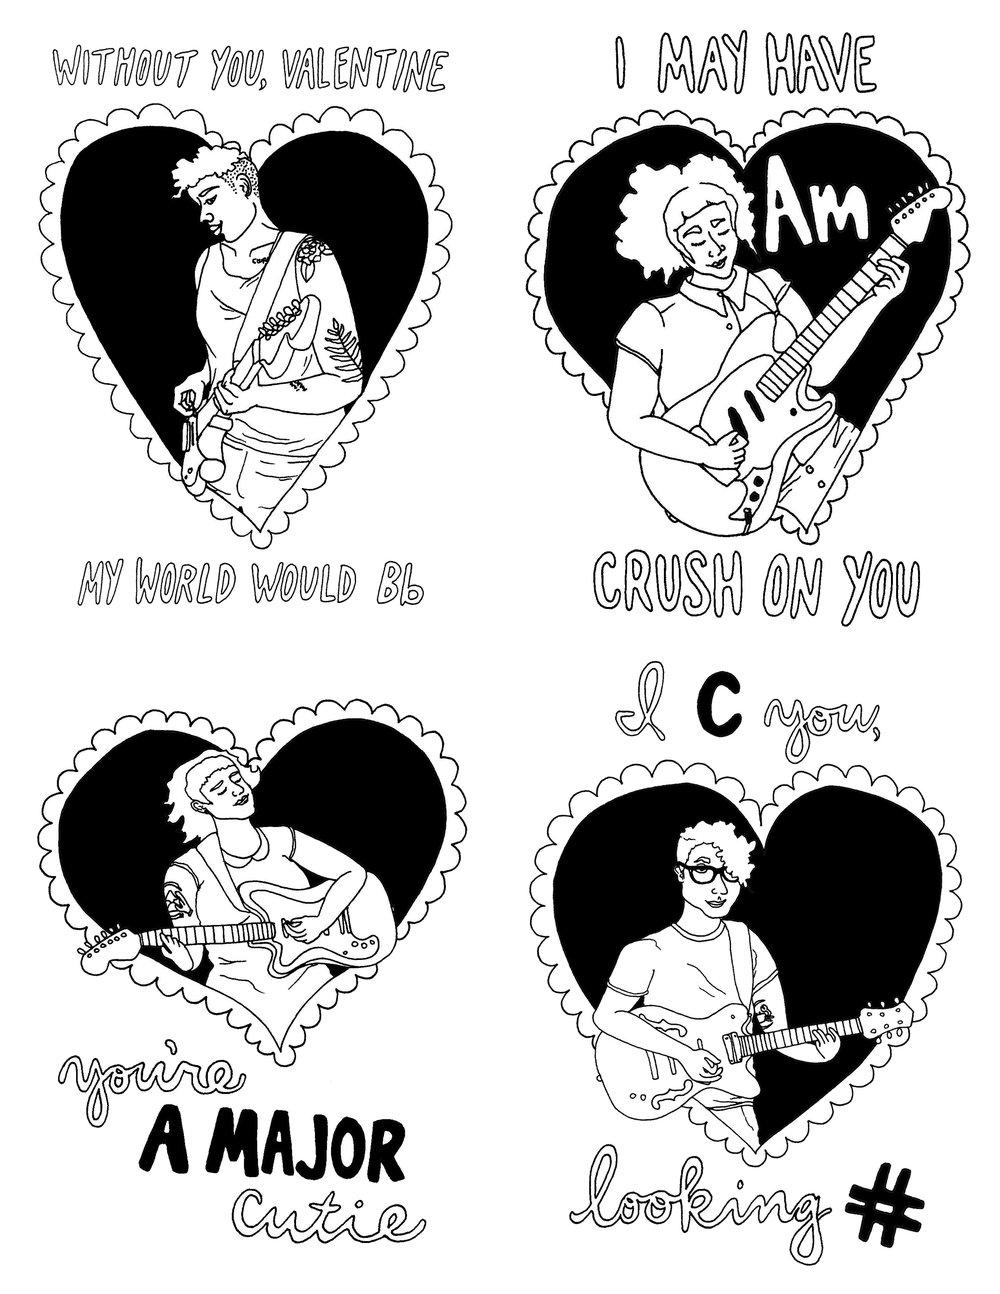 chord joke valentines